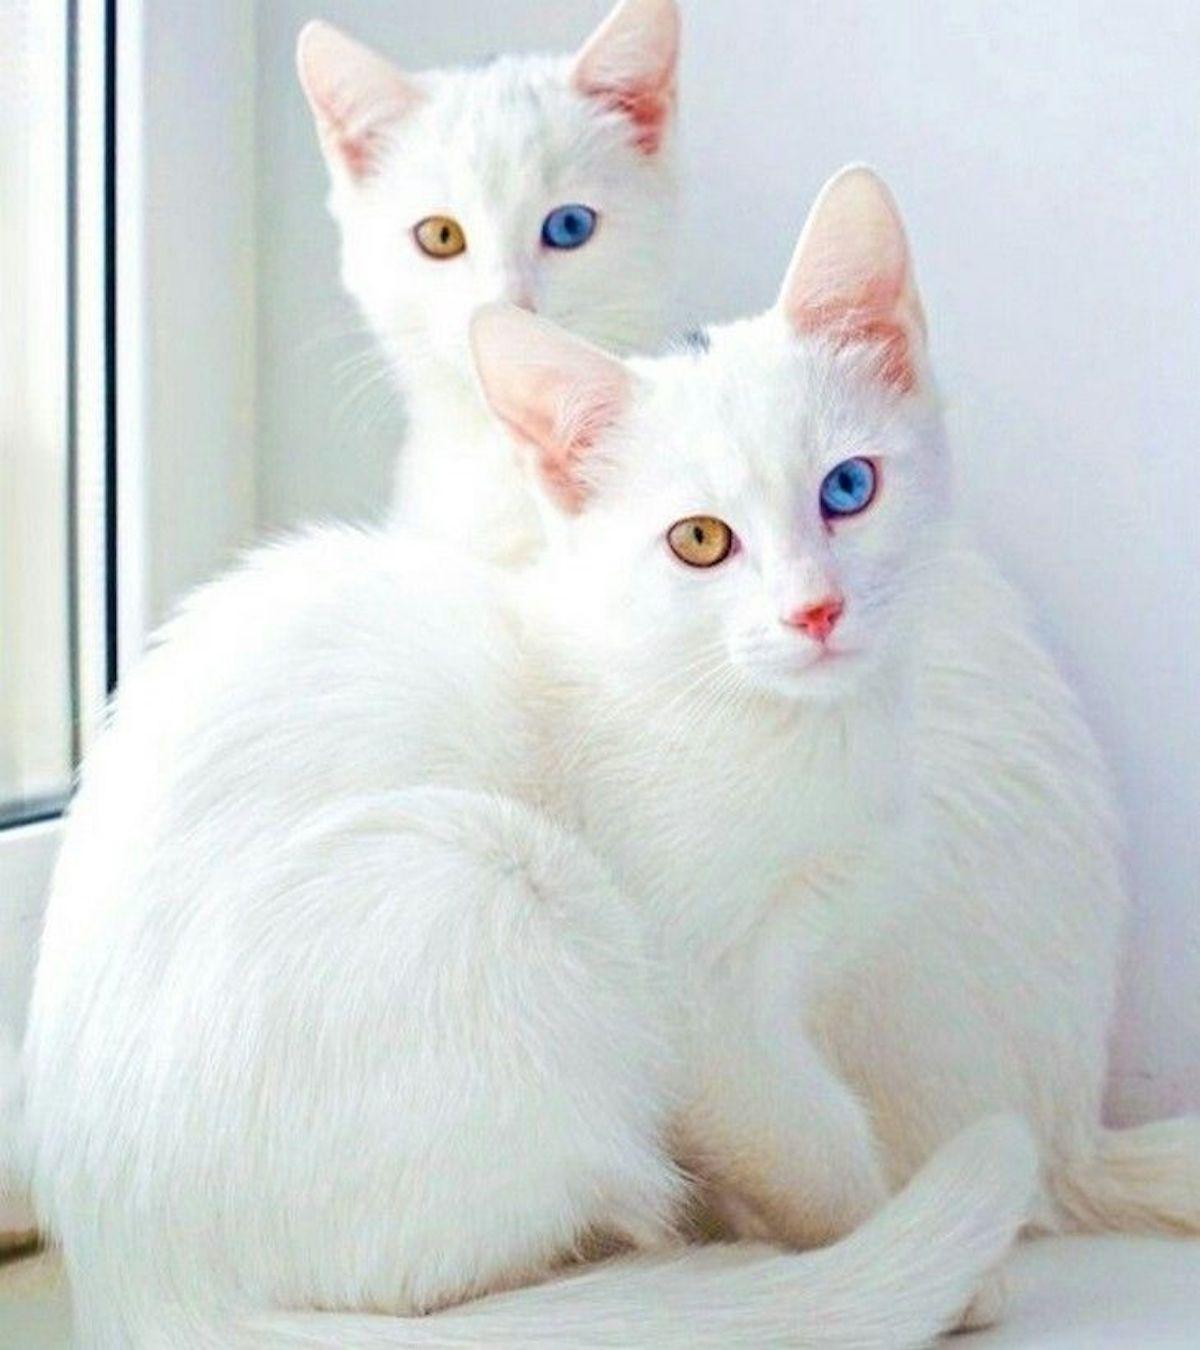 khao manee occhi belli